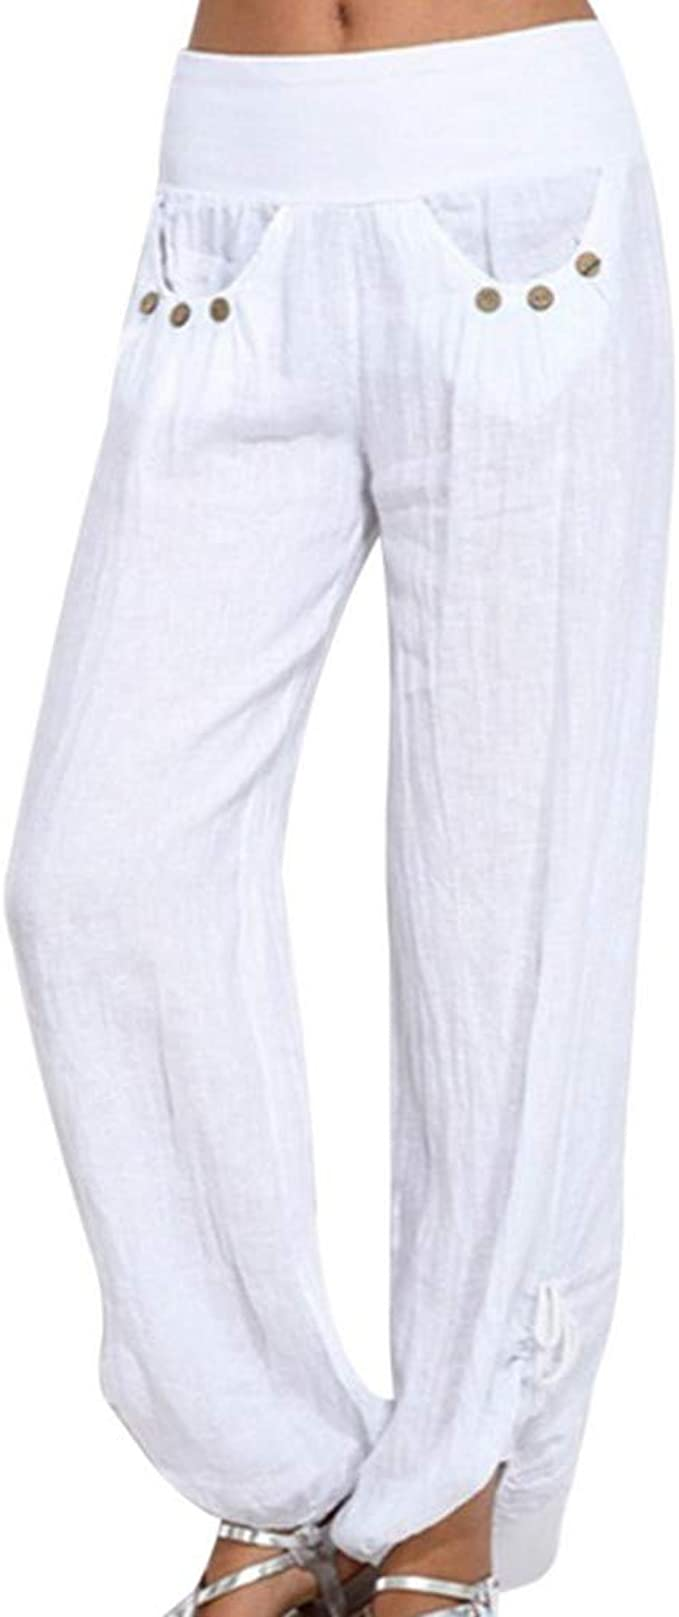 Pantaloni Harem Donna Cavallo Basso Larghi Pantalone da Yoga